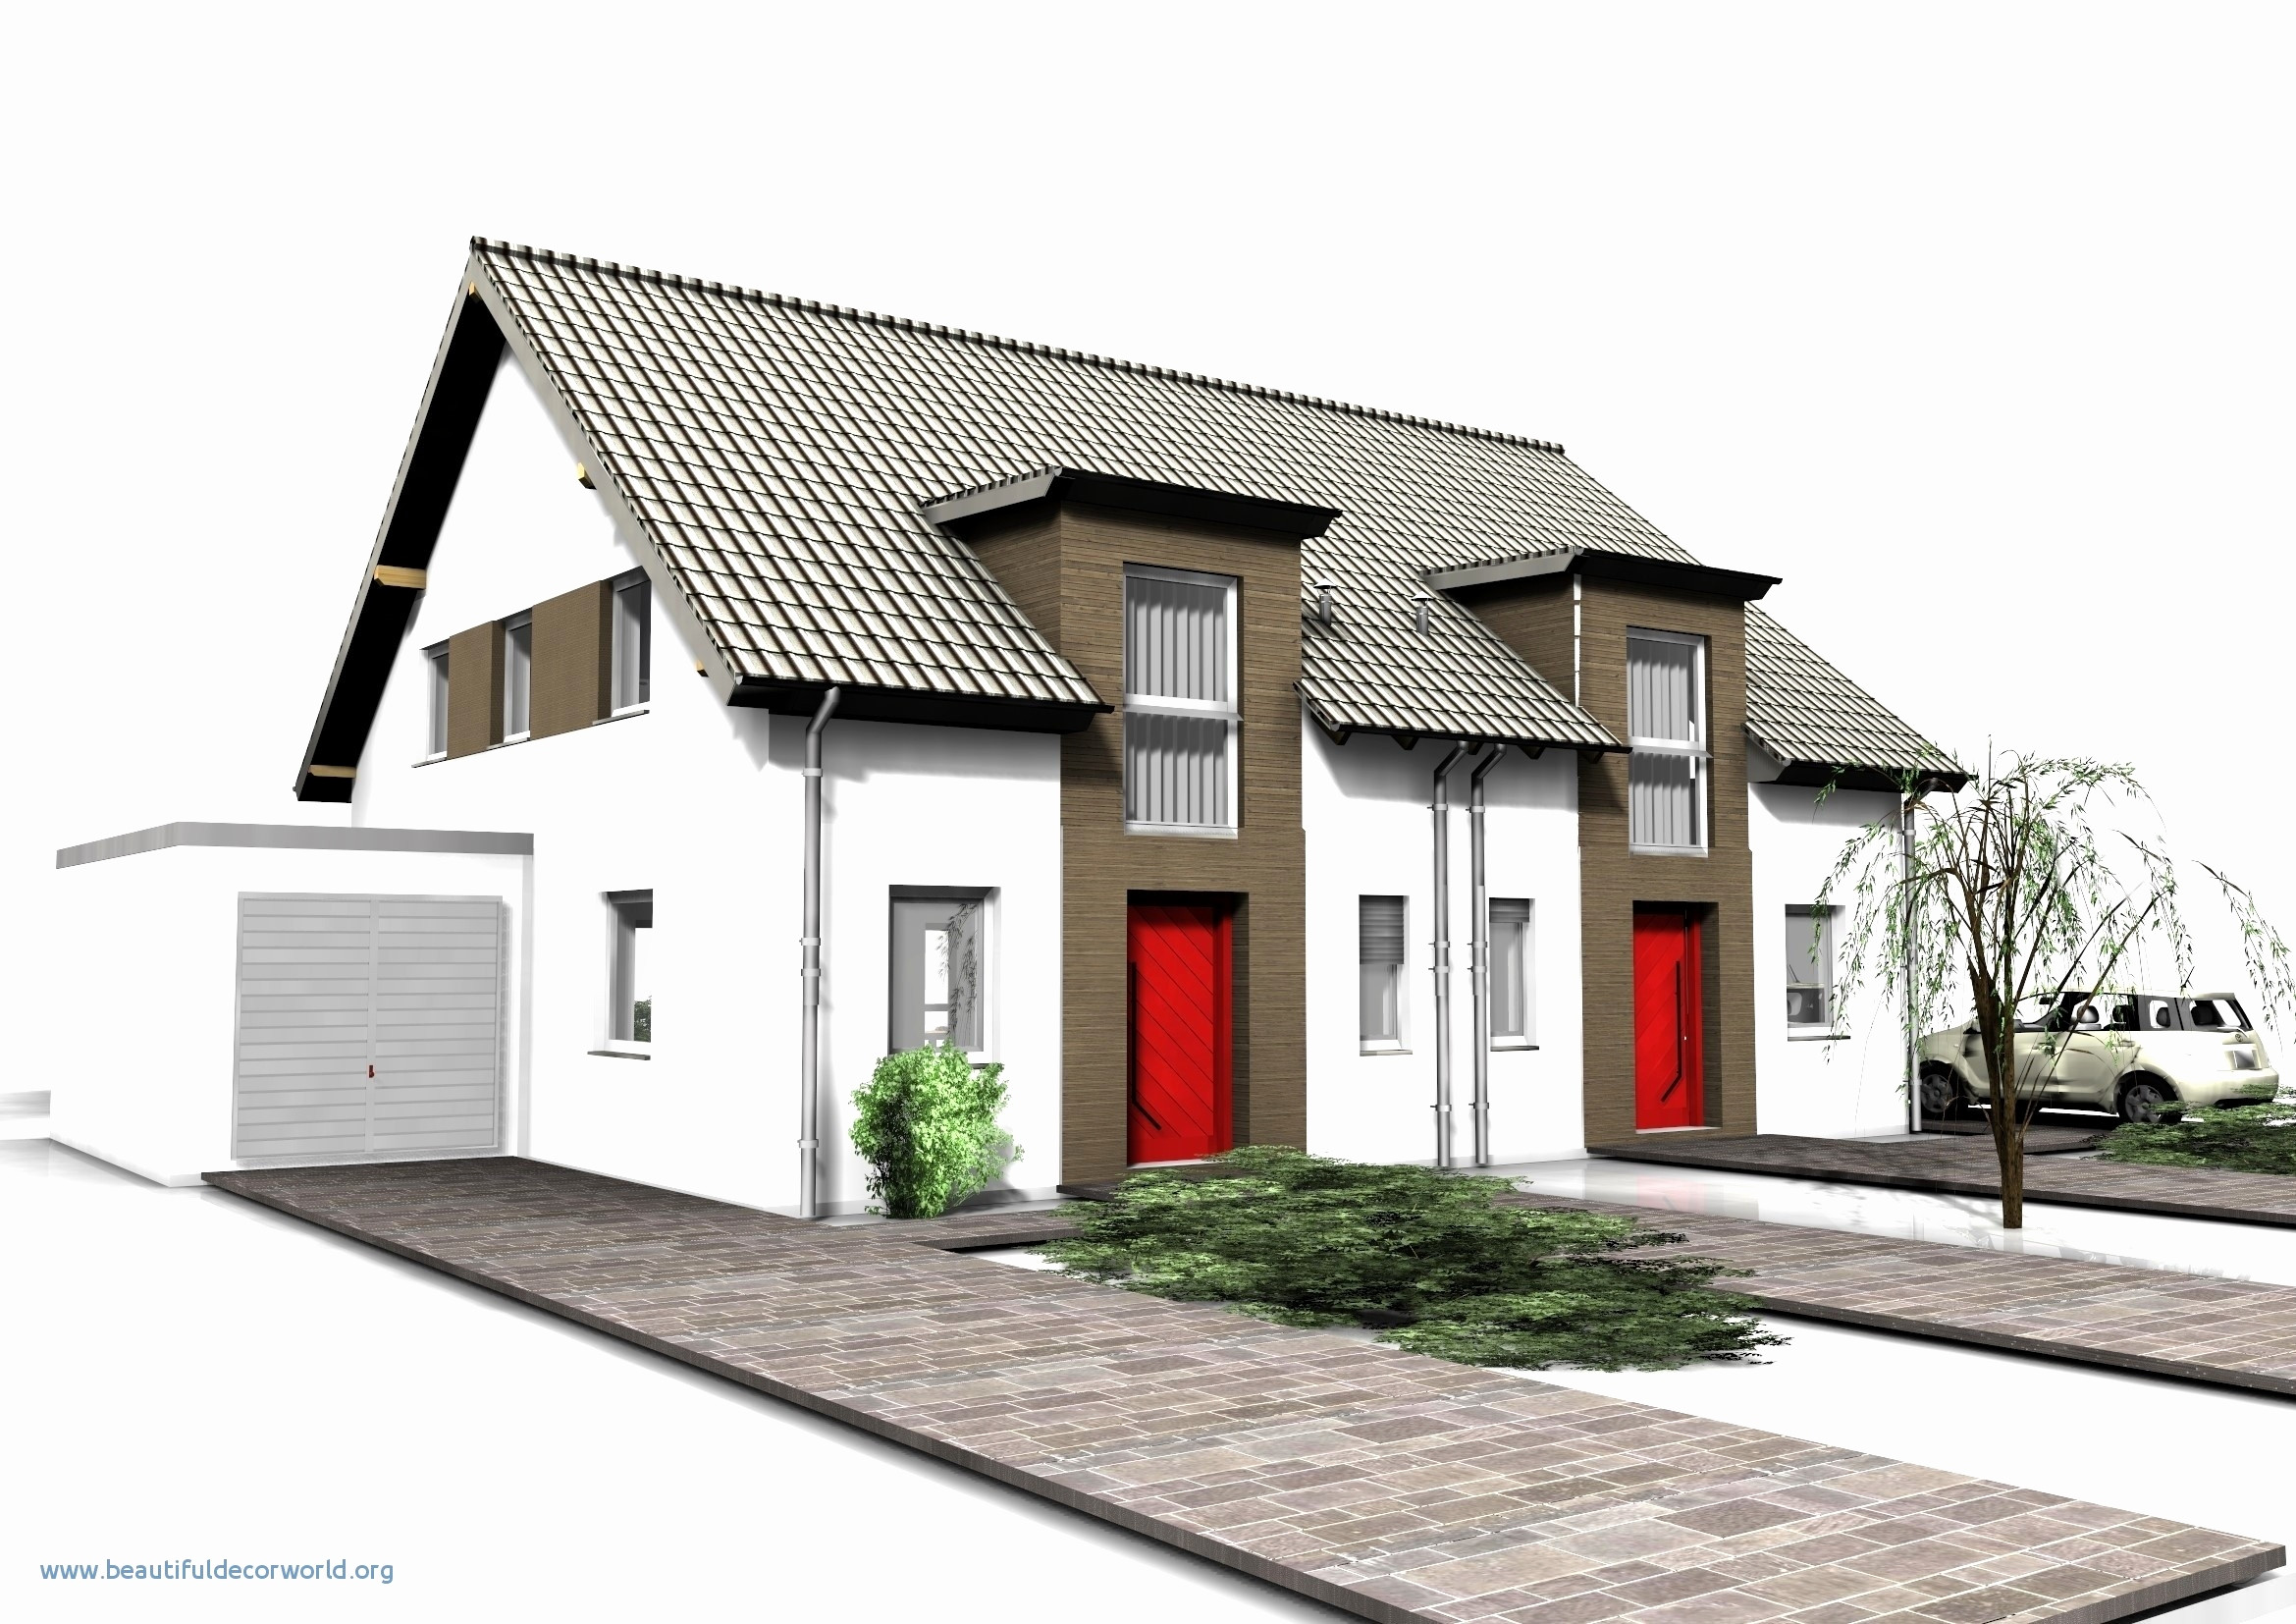 Haus Planen  Haus Selber Planen Kostenlos Schön Image Haus 3d Planen